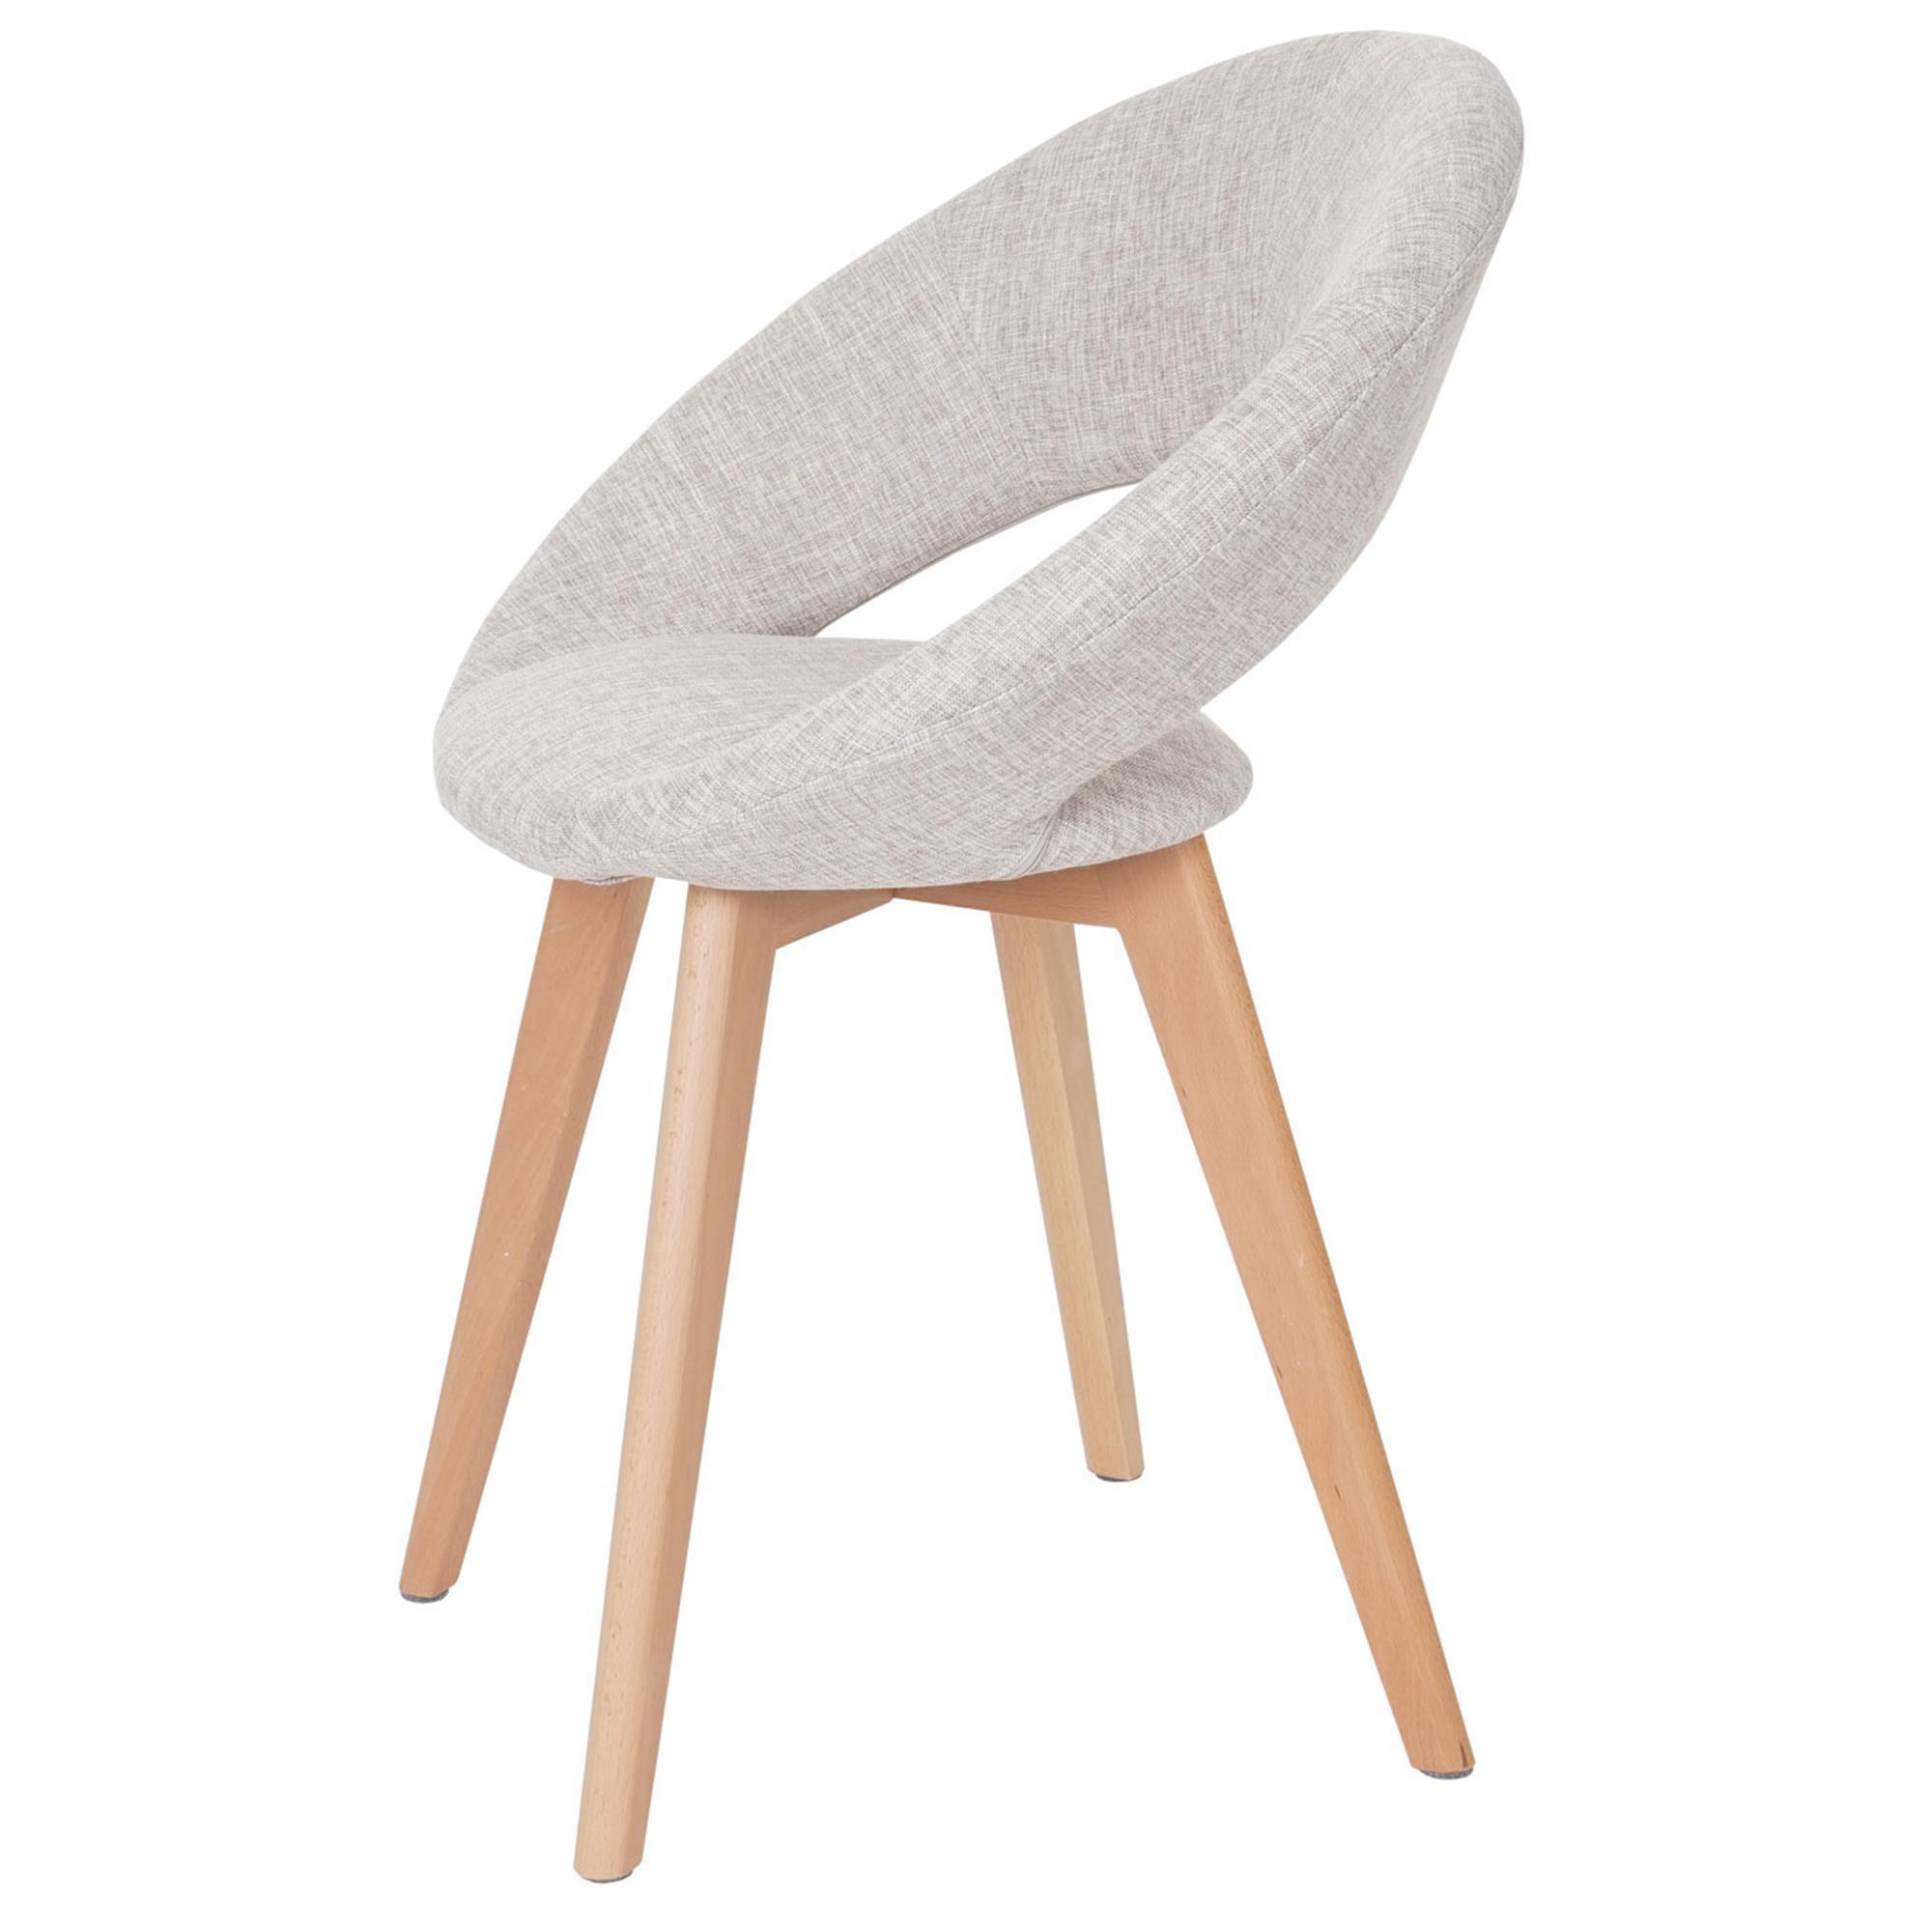 silla de comedor vedri dise o retro en tela crema silla